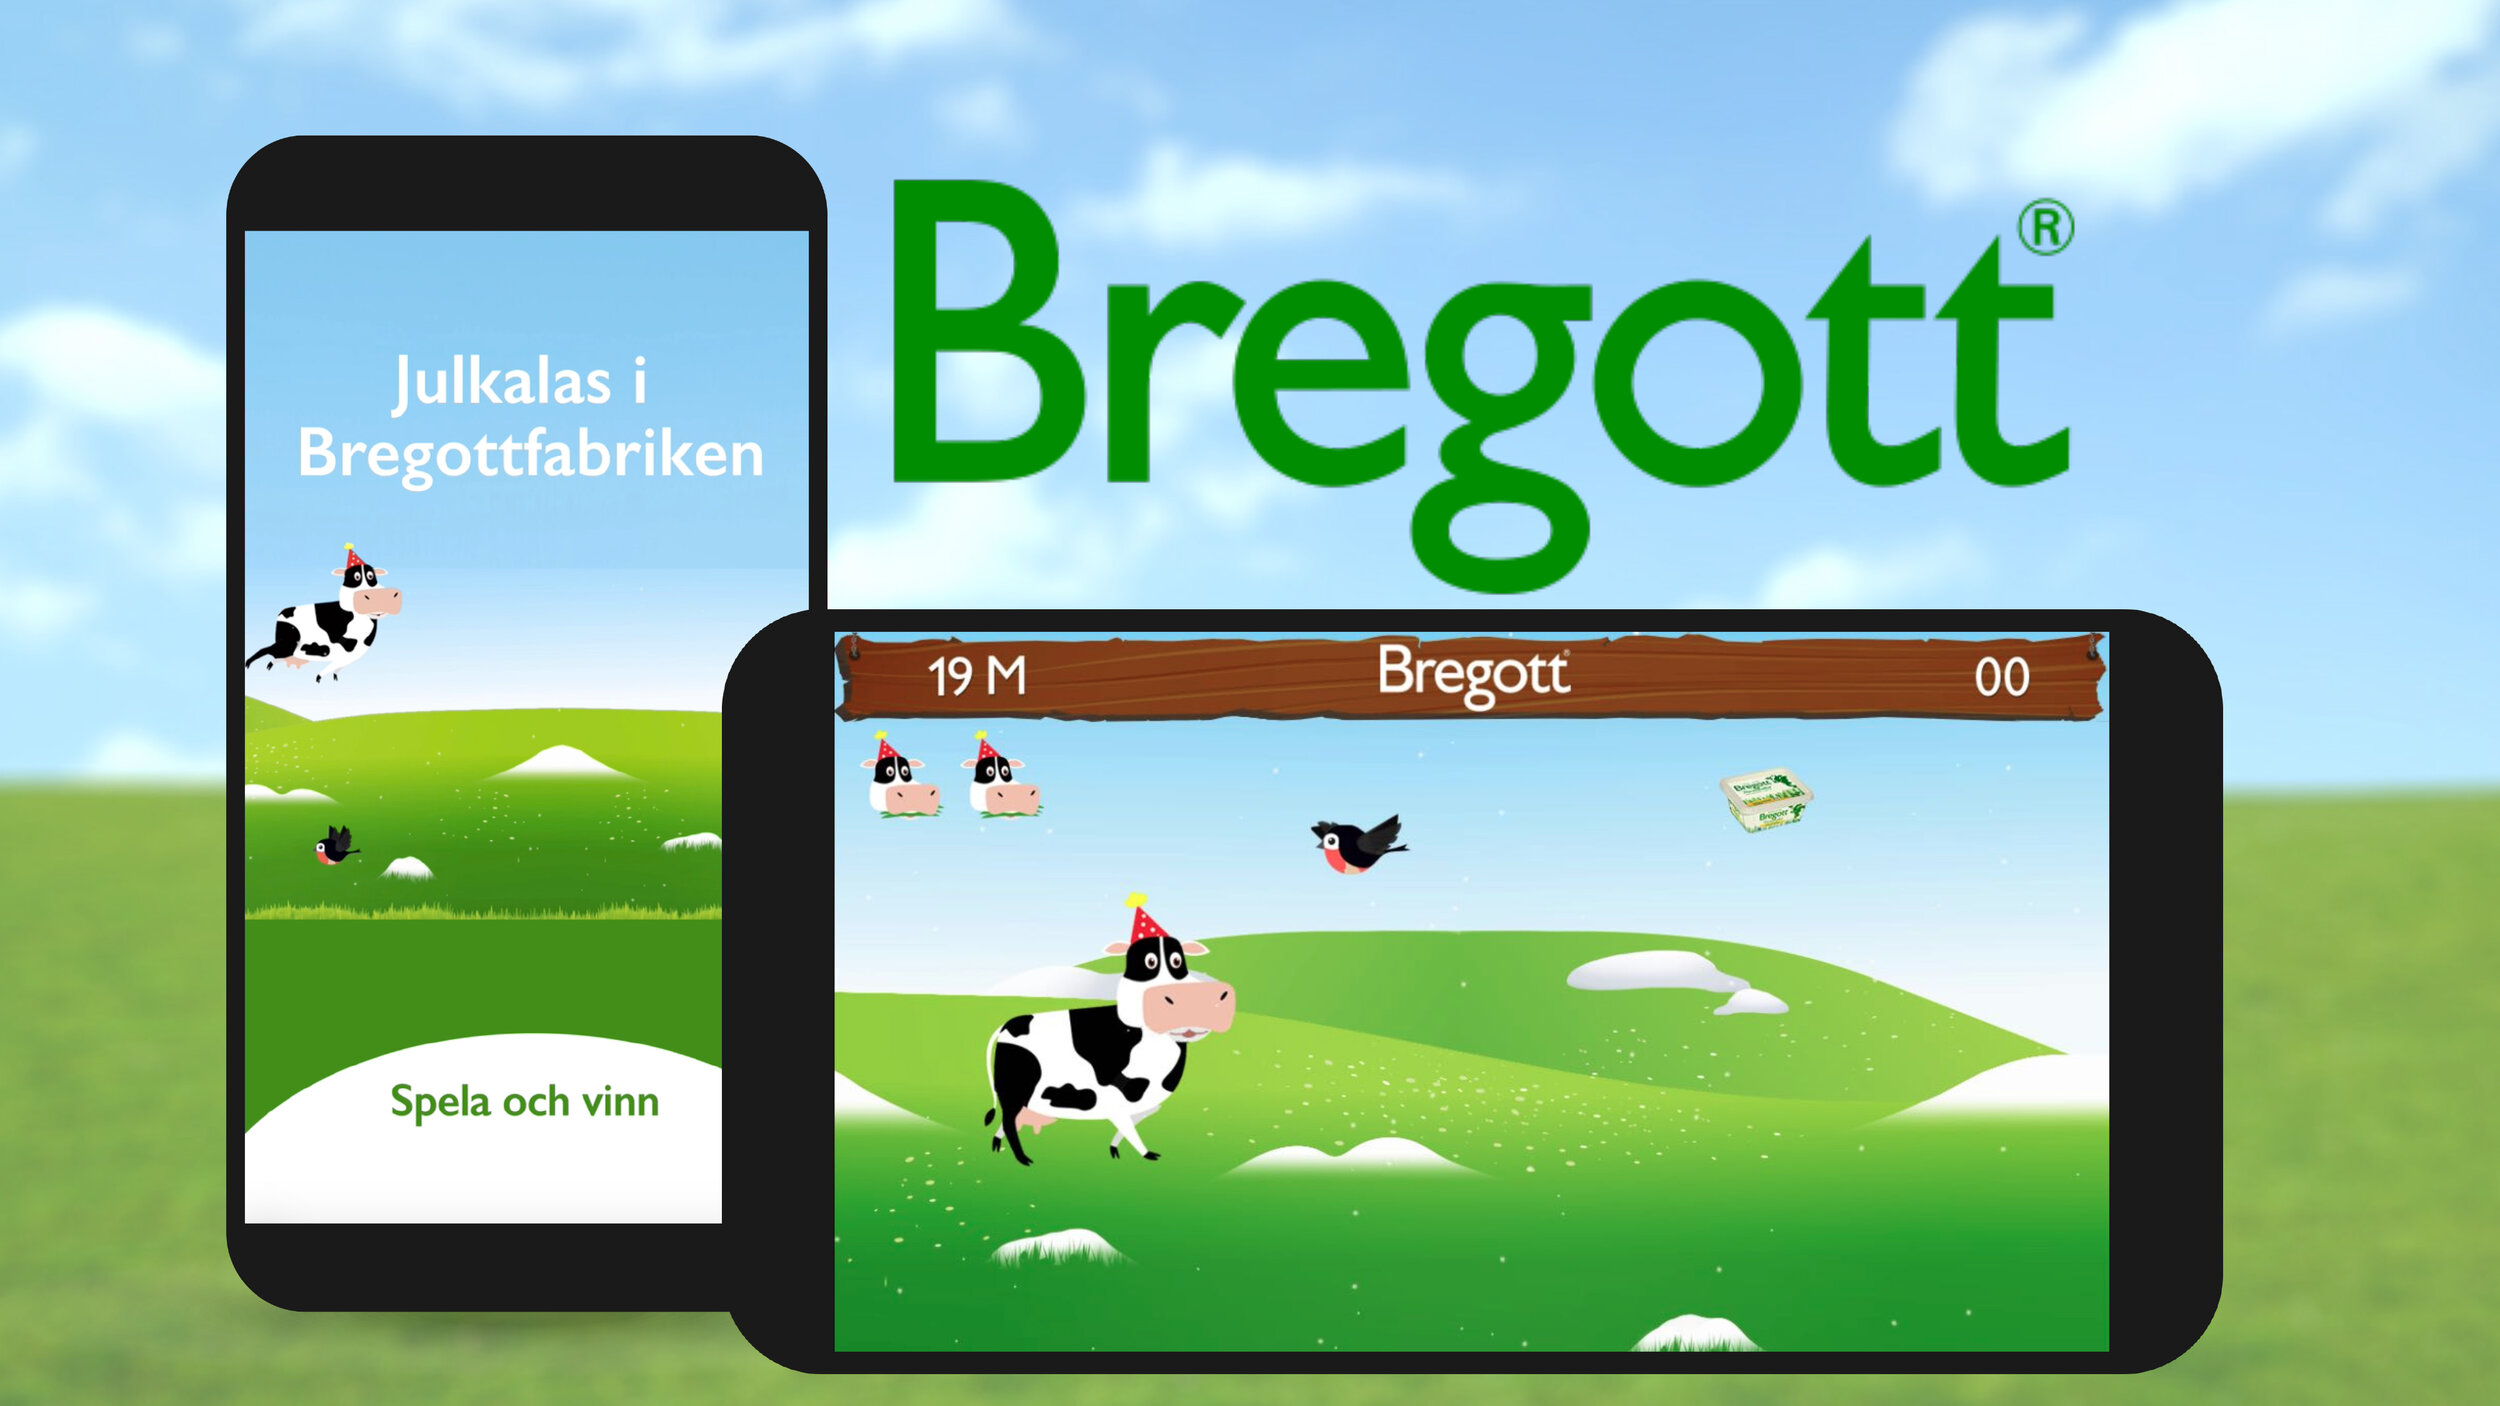 BREGOTT_CASE_site.jpg